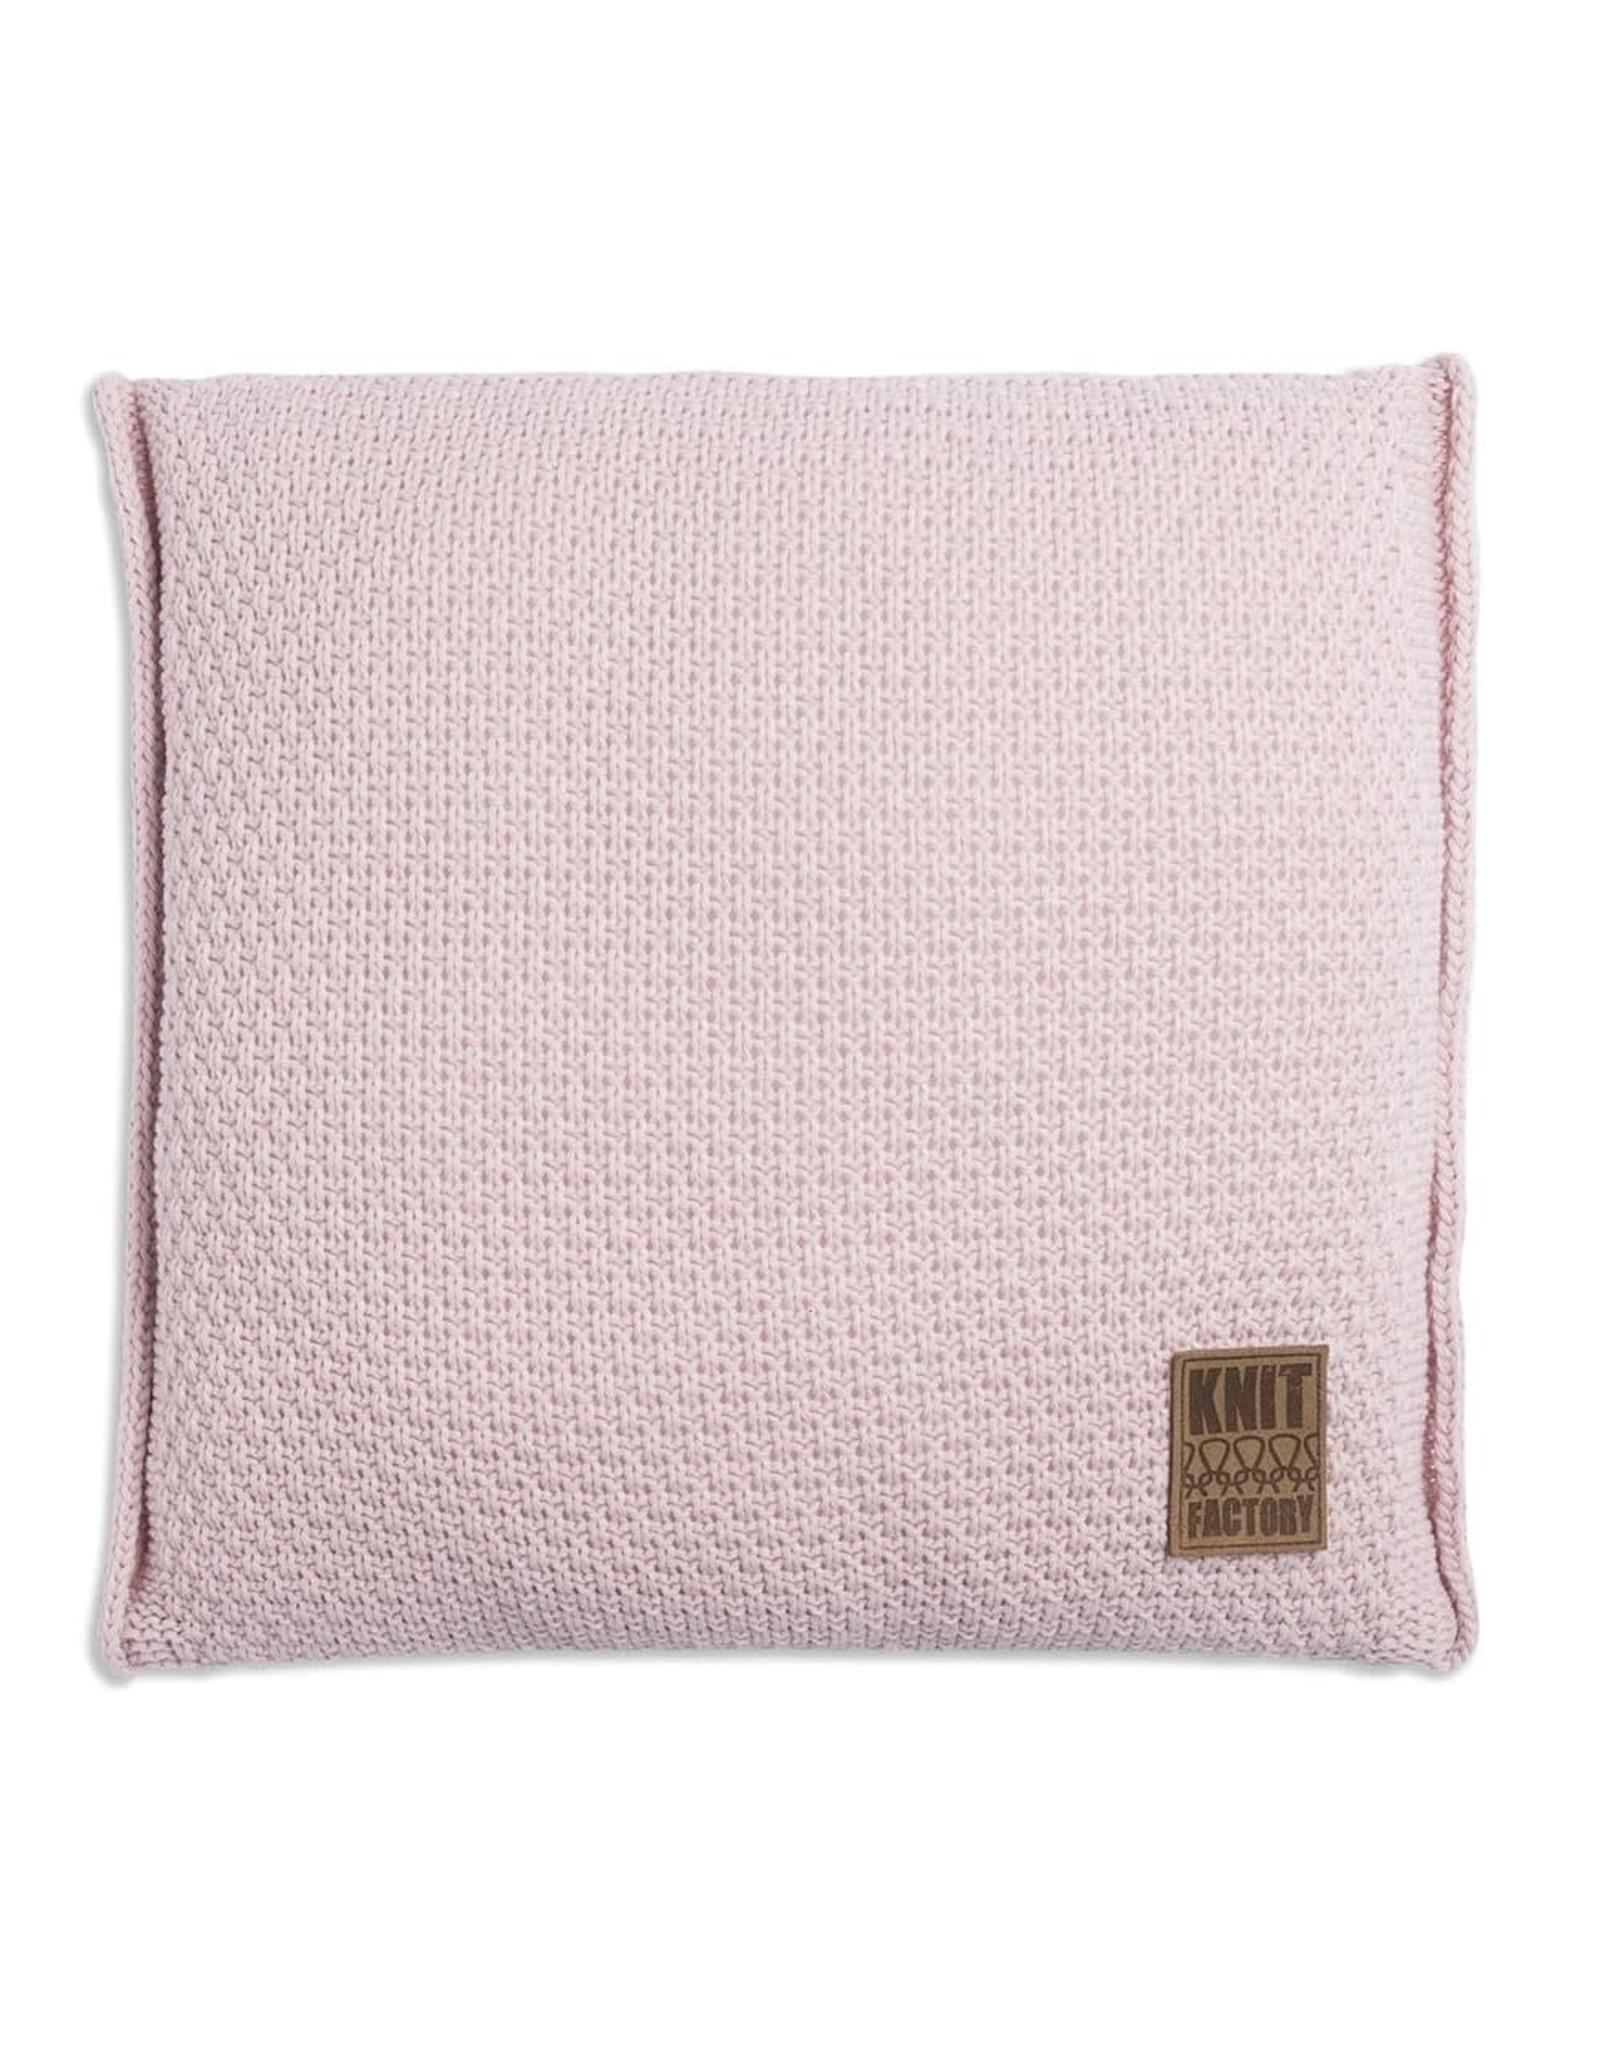 Knit Factory Knit Factory Kussen Jesse 50x50 roze